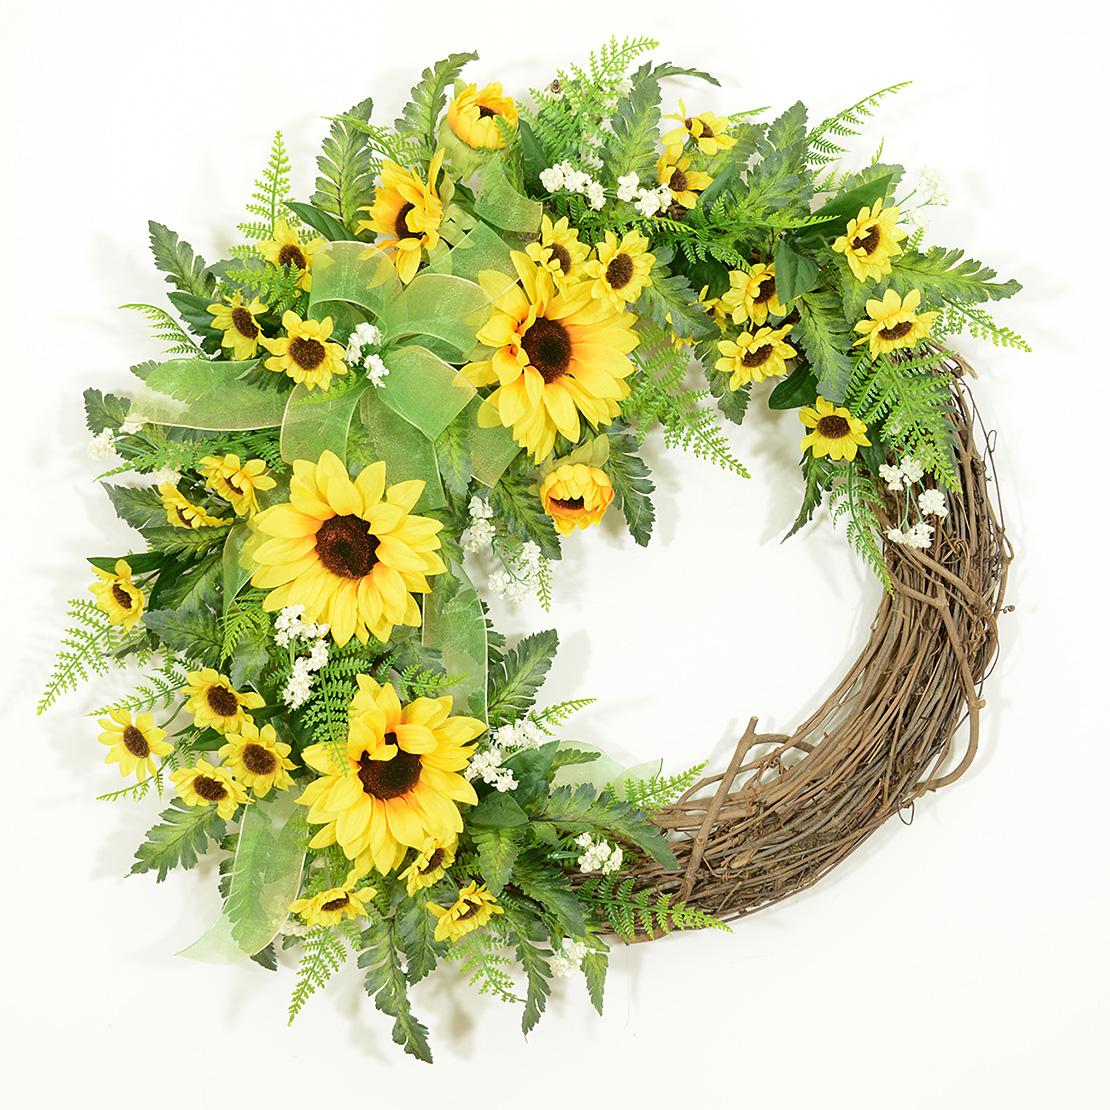 Ferns Flowers Summer Wreath Wreaths Unlimited